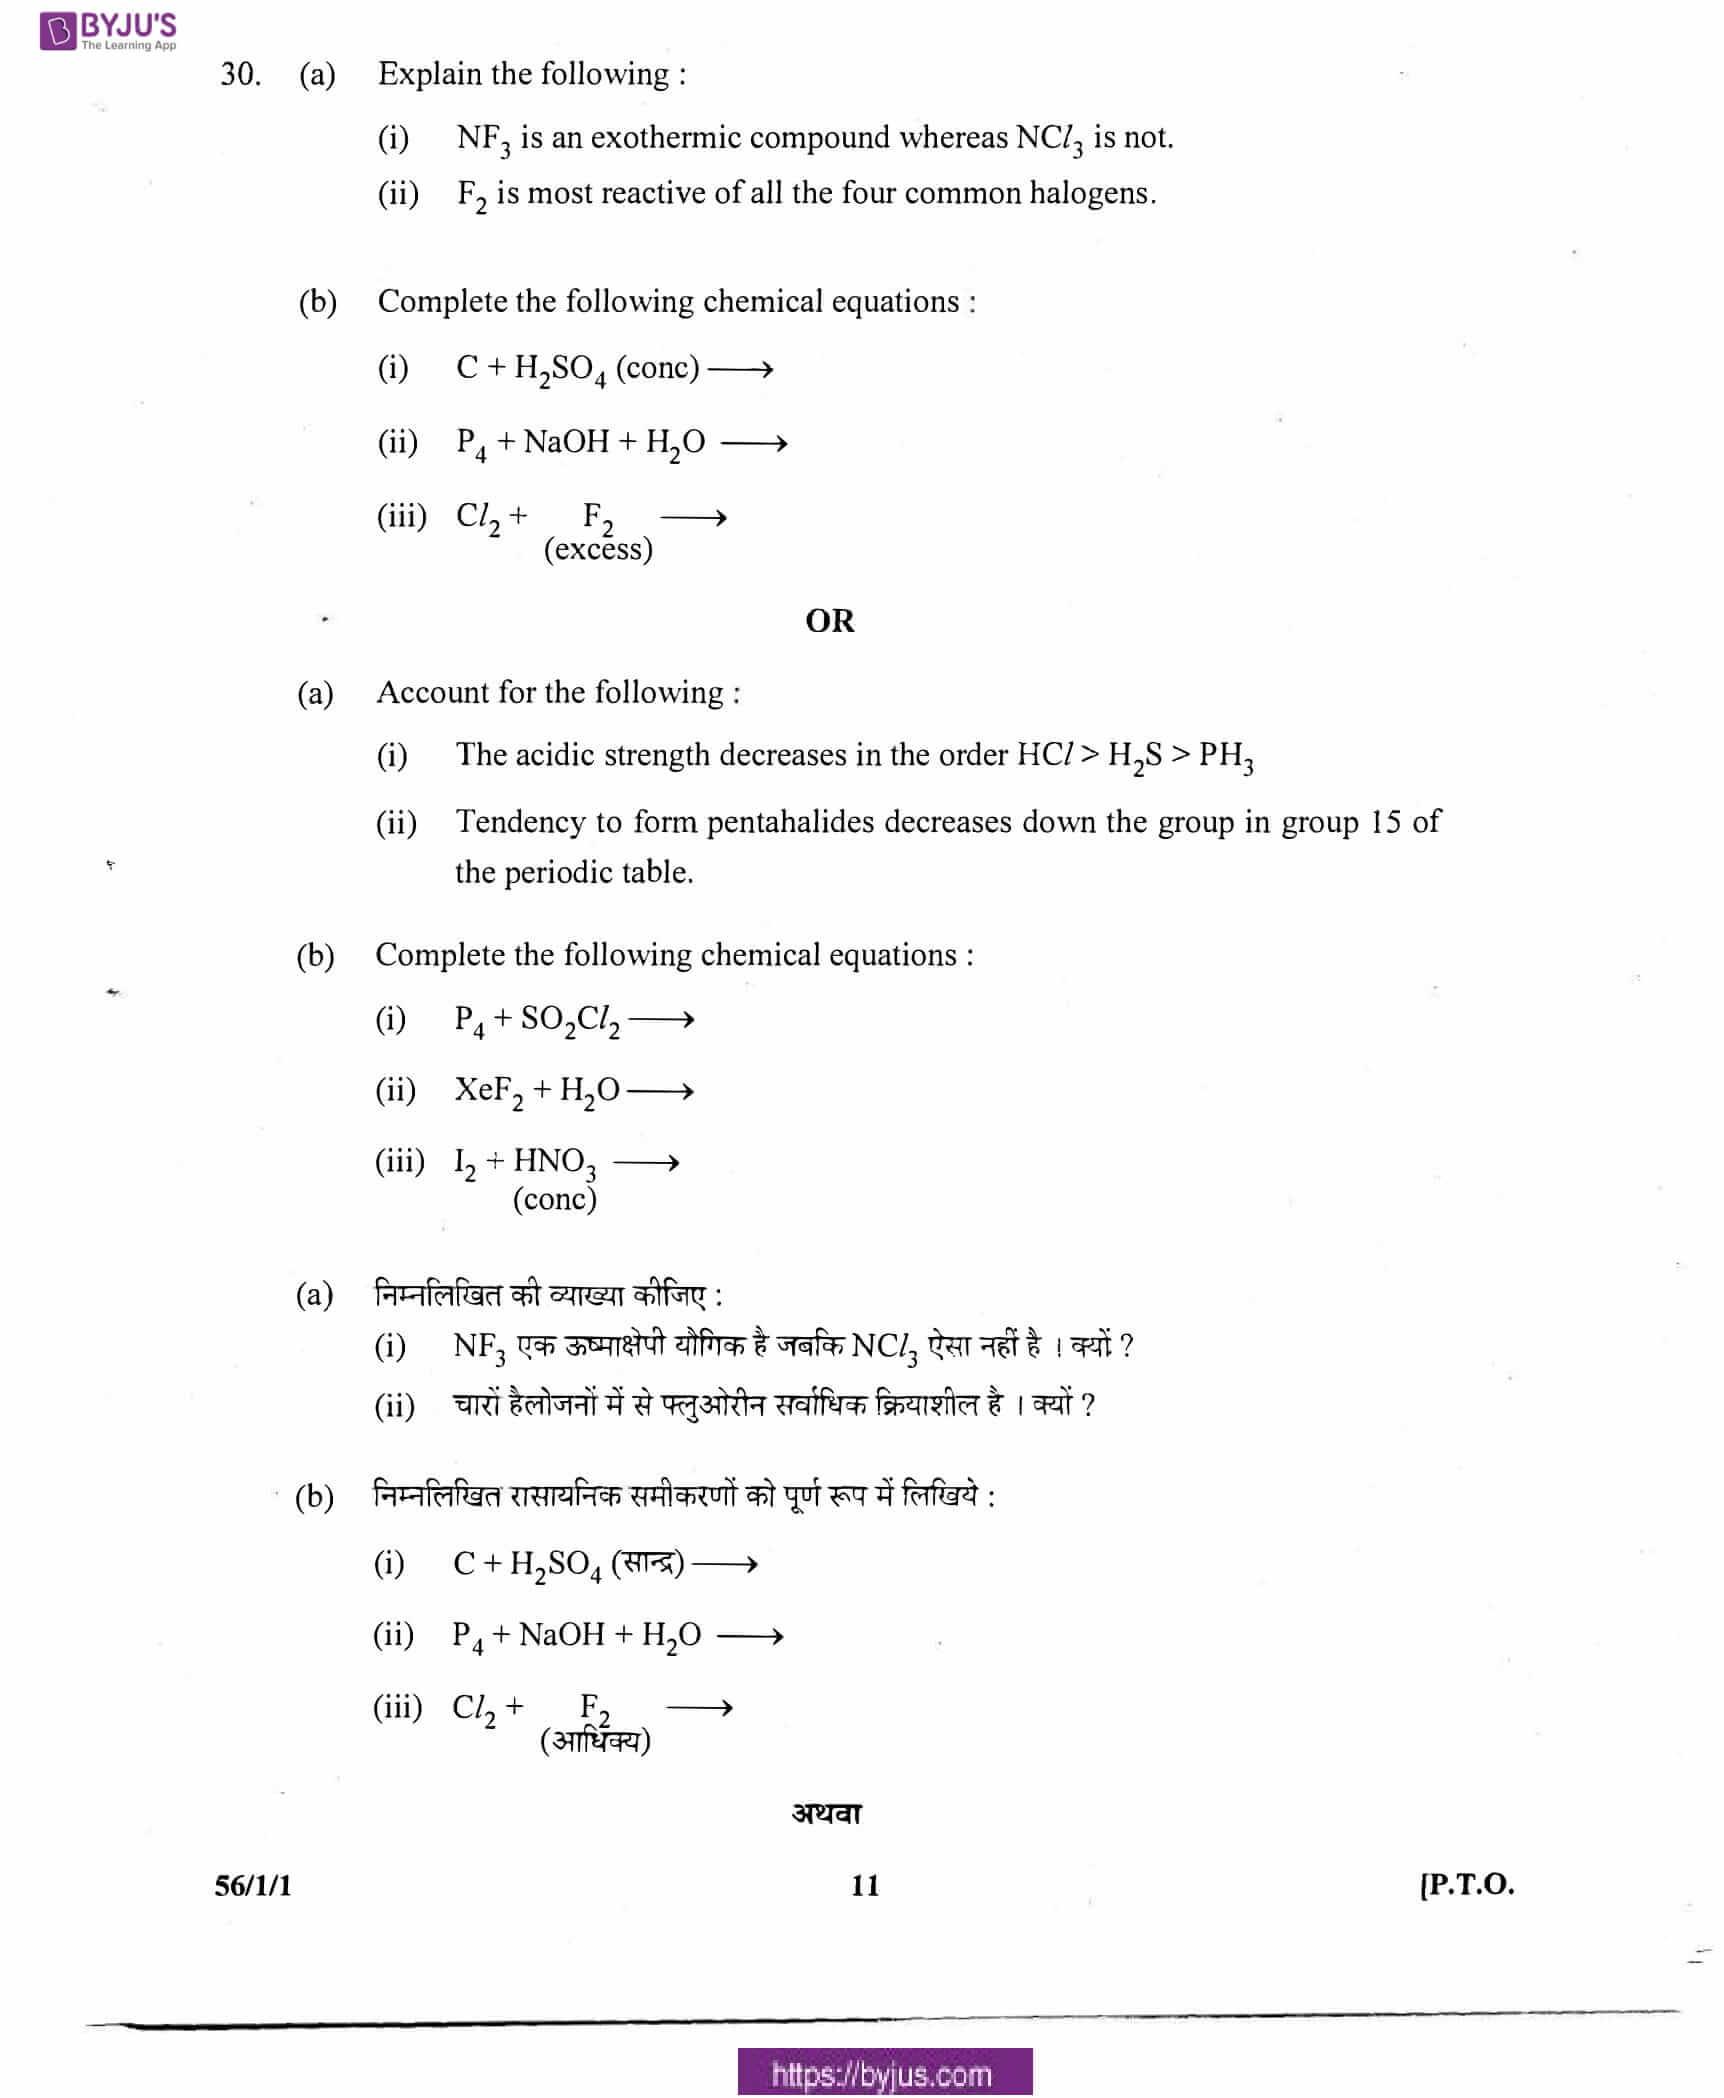 cbse class 10 chemistry question paper 2011 set 1